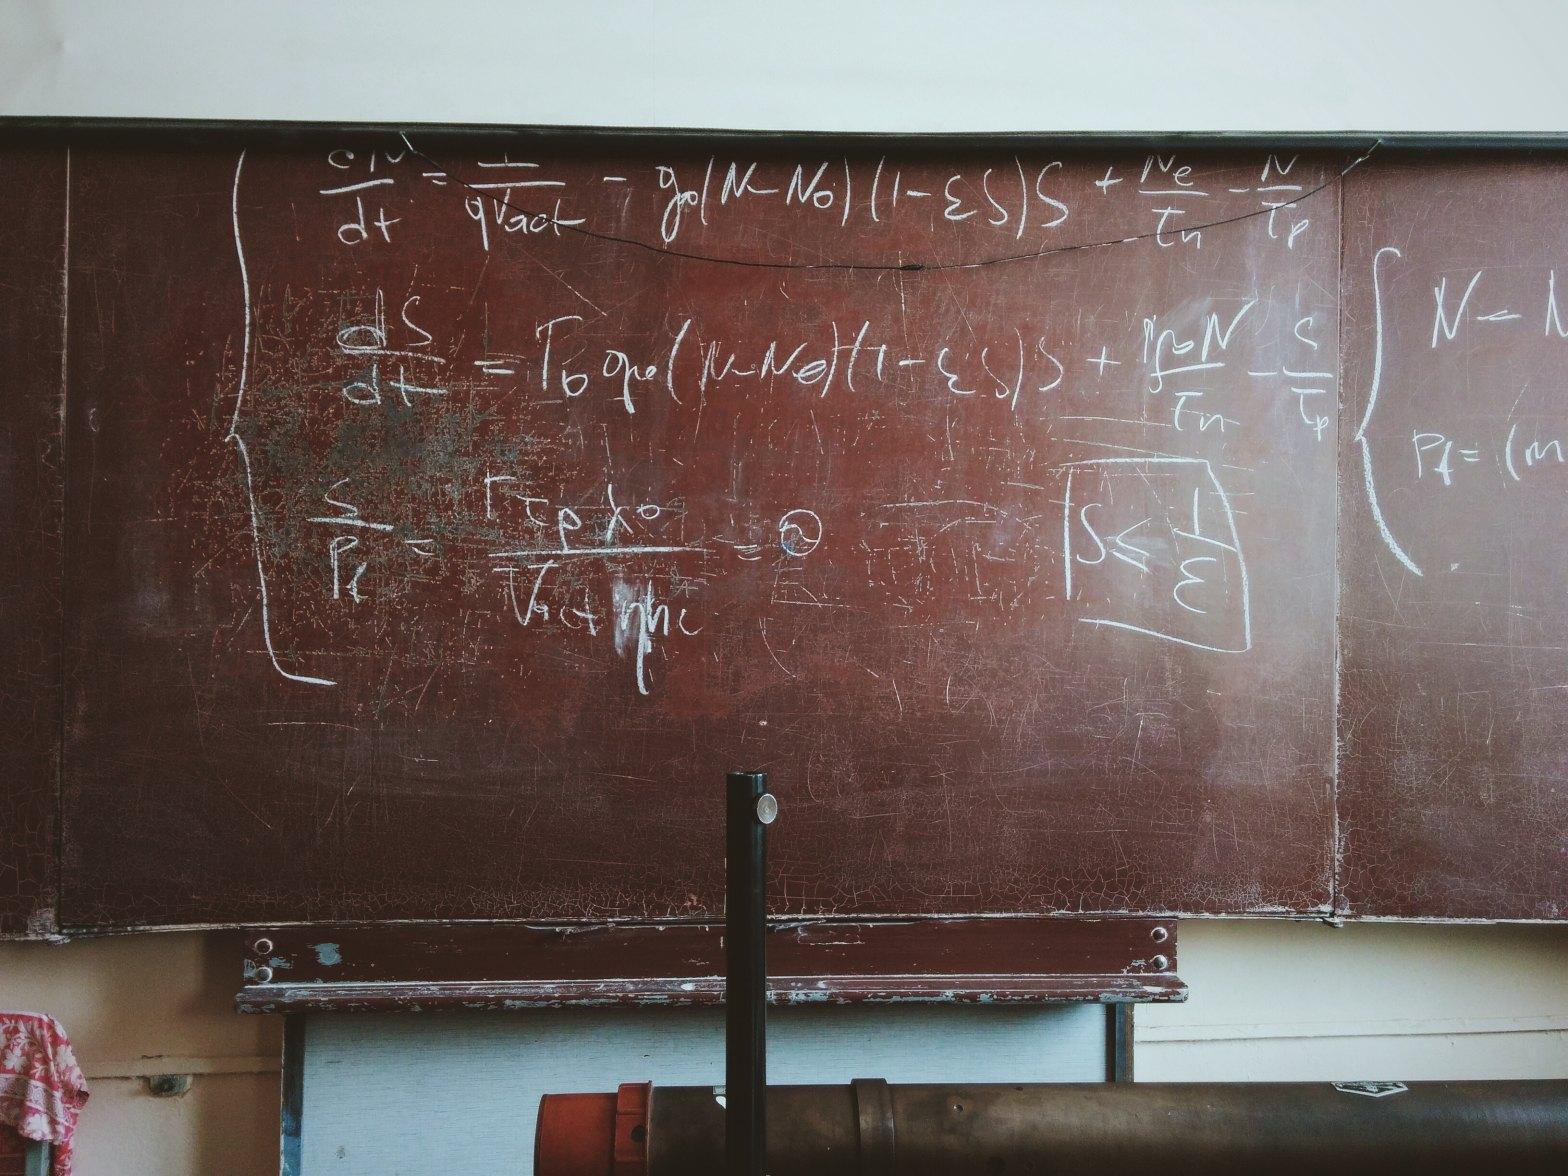 Classroom Blackboard. Photo by Roman Mager